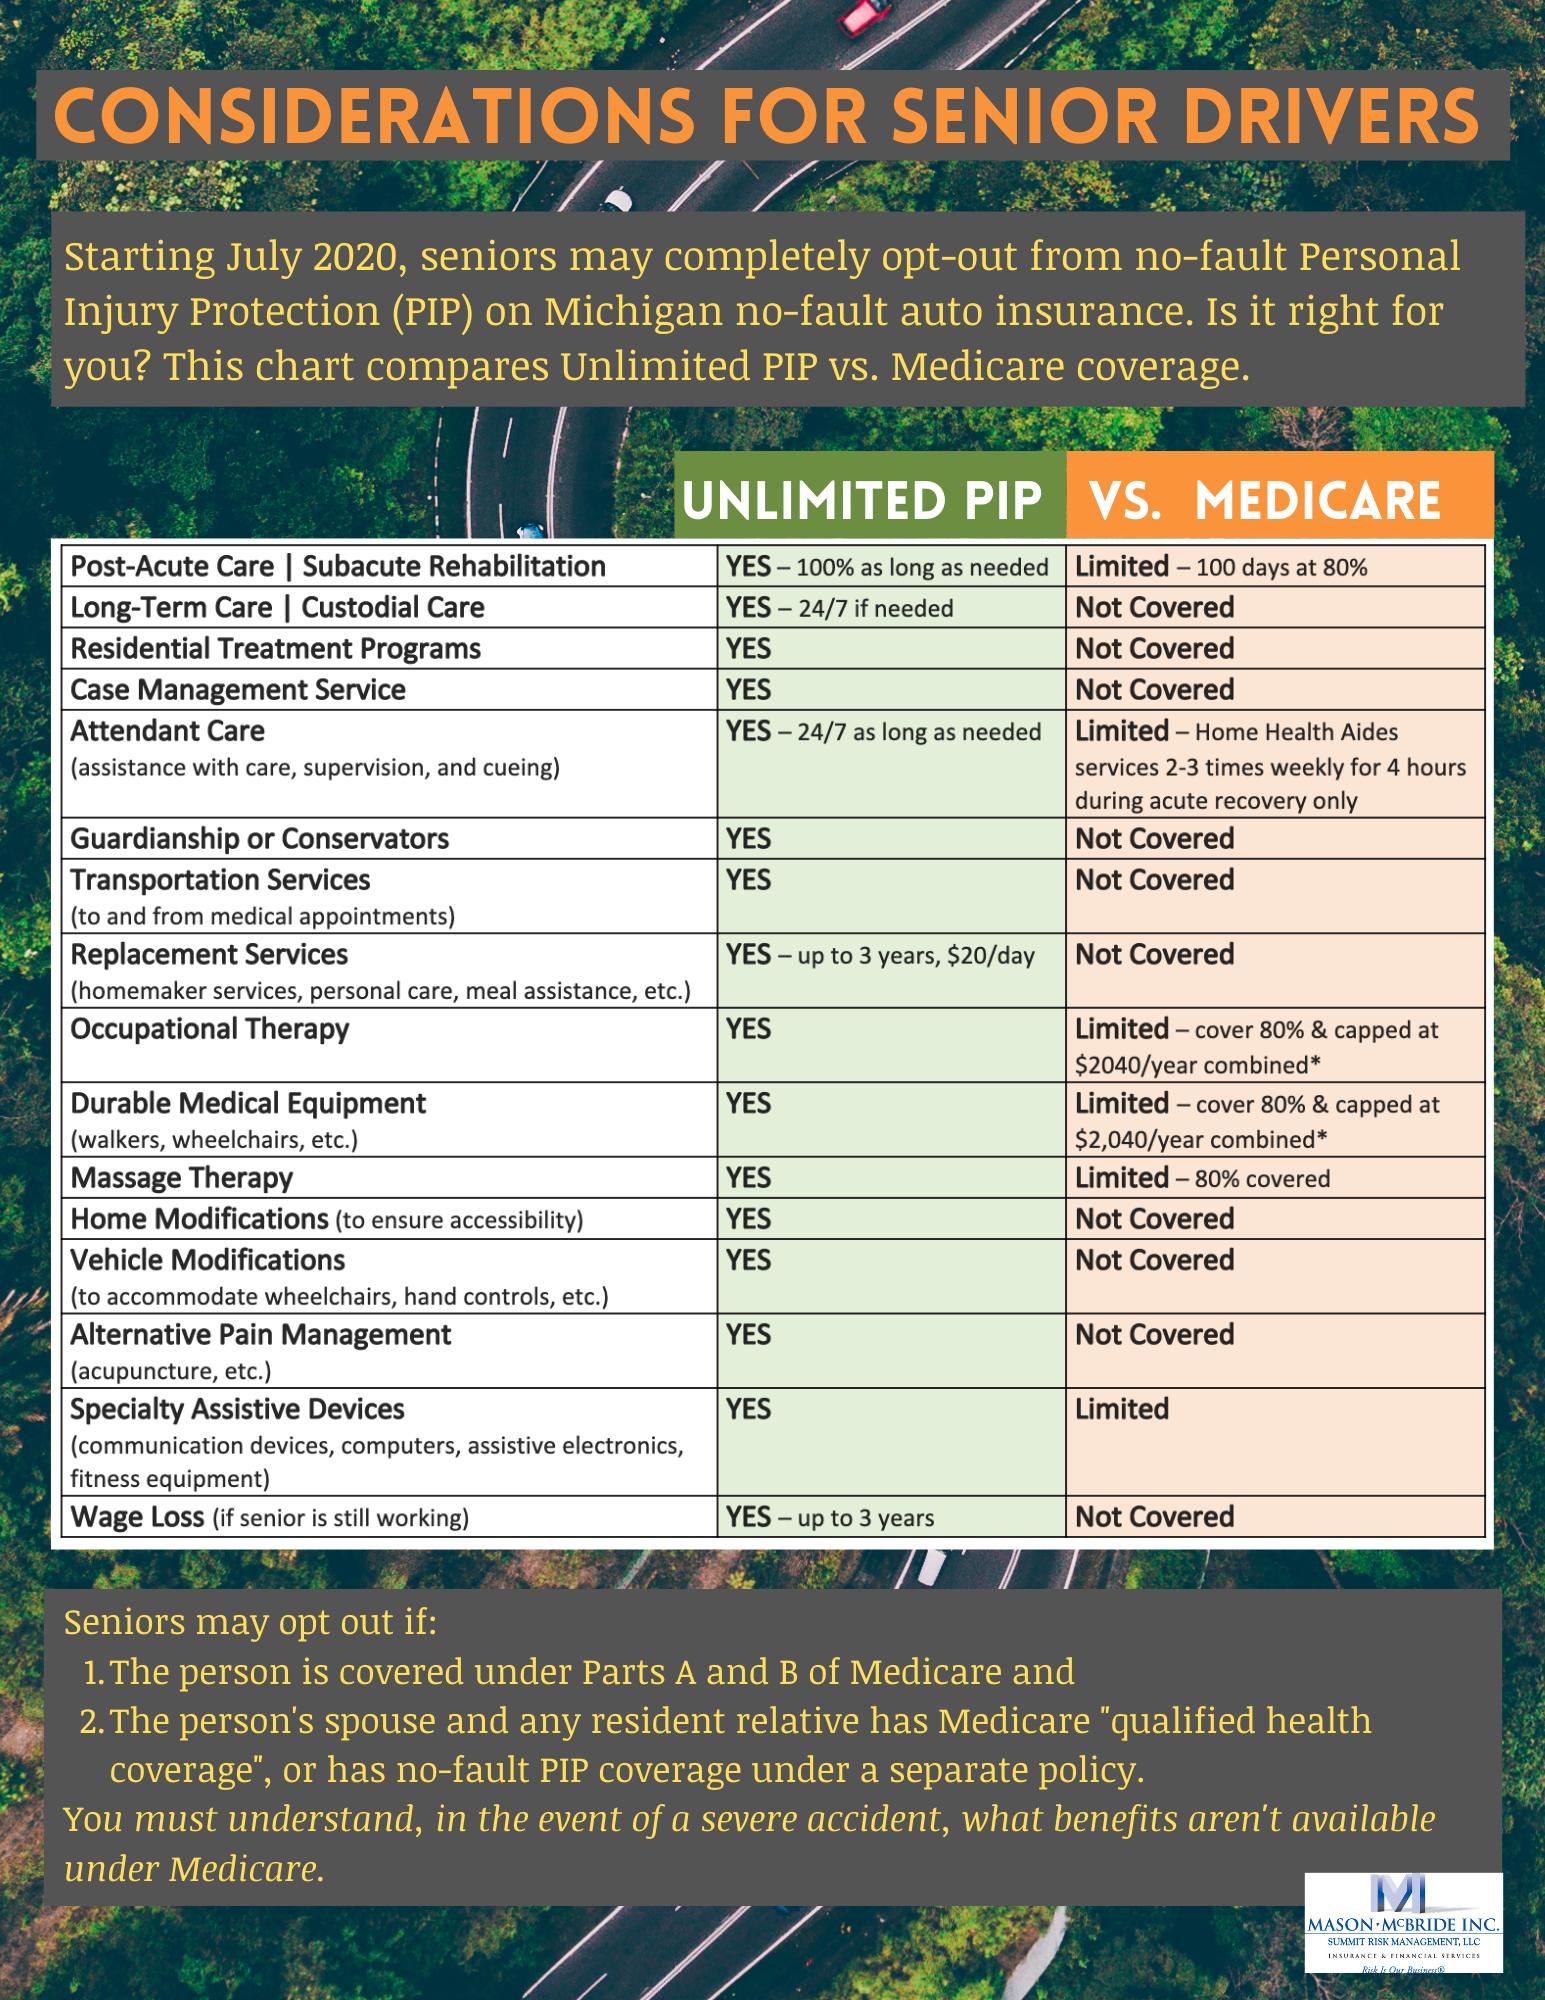 Chart of Unlimited PIP va. Medicare coverage for Michigan Senior Citizens